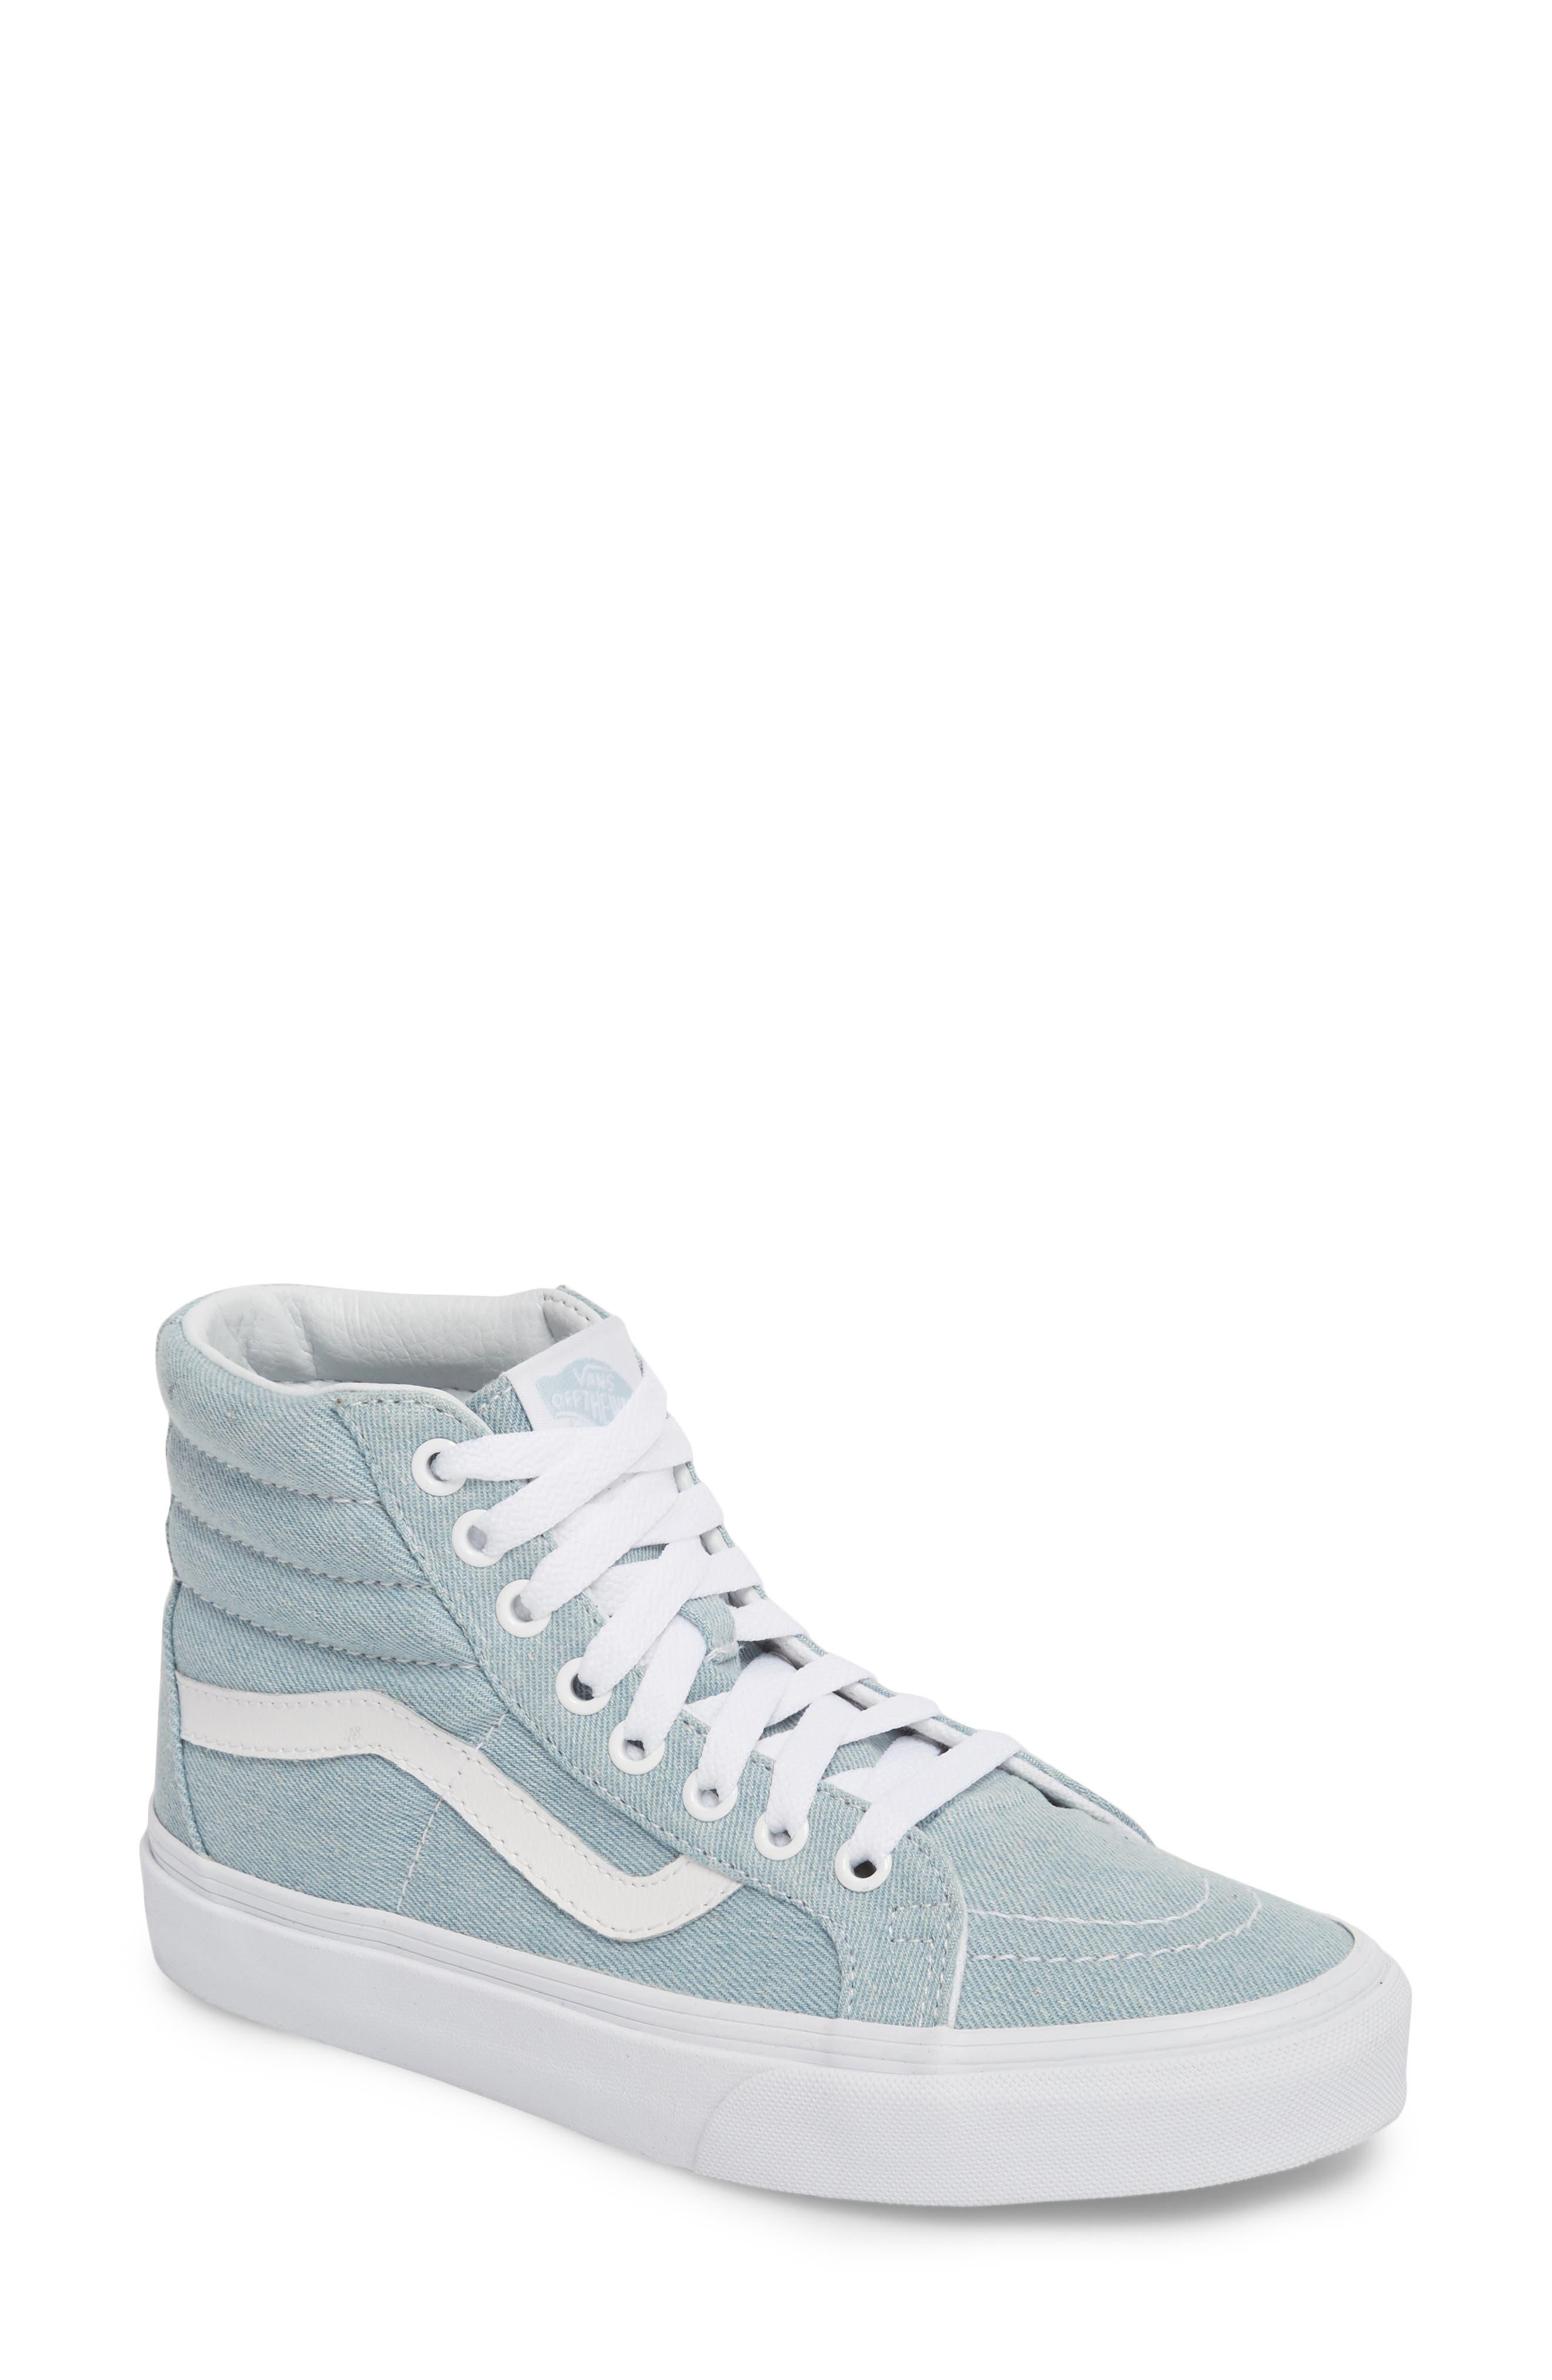 'Sk8-Hi Reissue' Sneaker,                             Main thumbnail 1, color,                             Denim Baby Blue